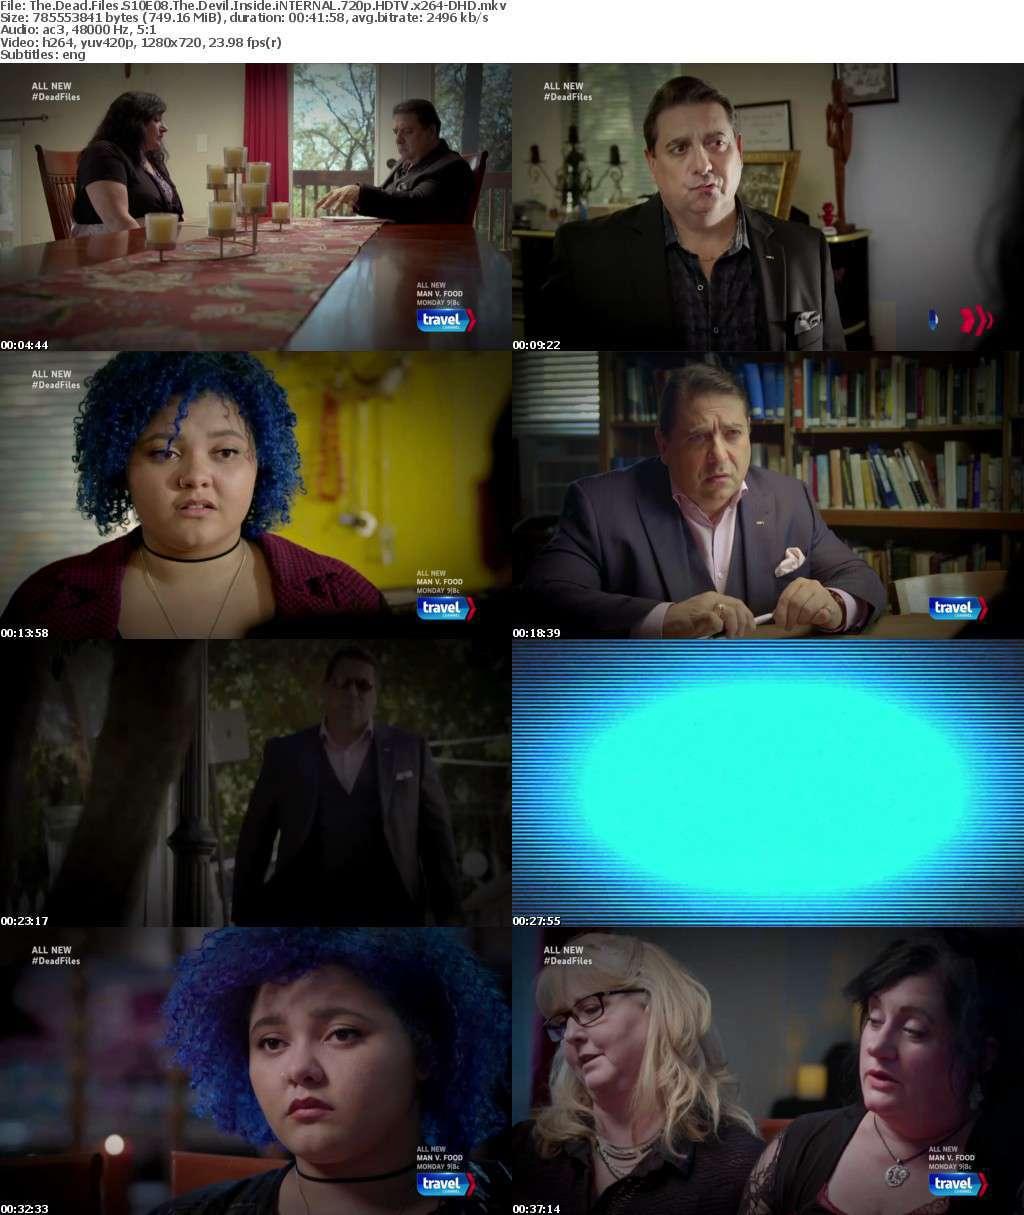 The Dead Files S10E08 The Devil Inside iNTERNAL 720p HDTV x264-DHD